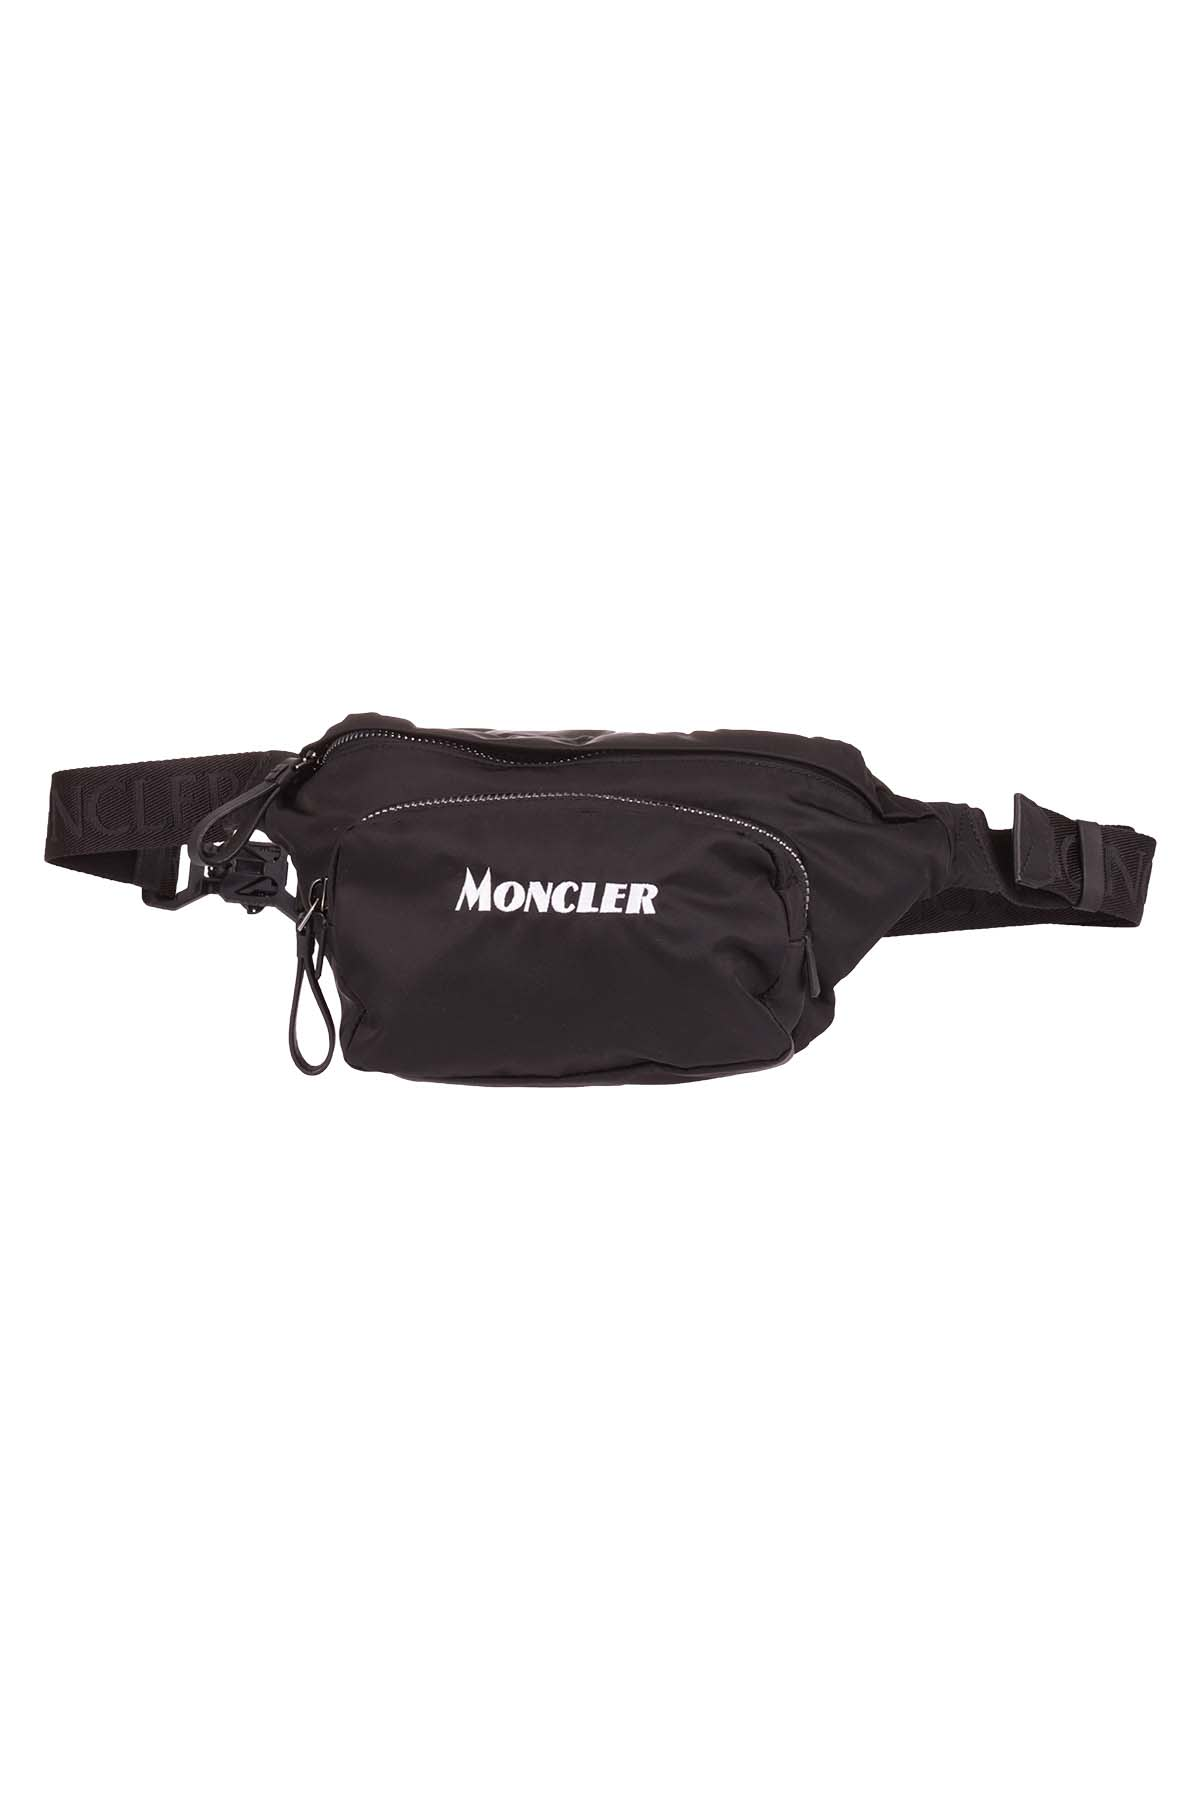 Moncler Luggage